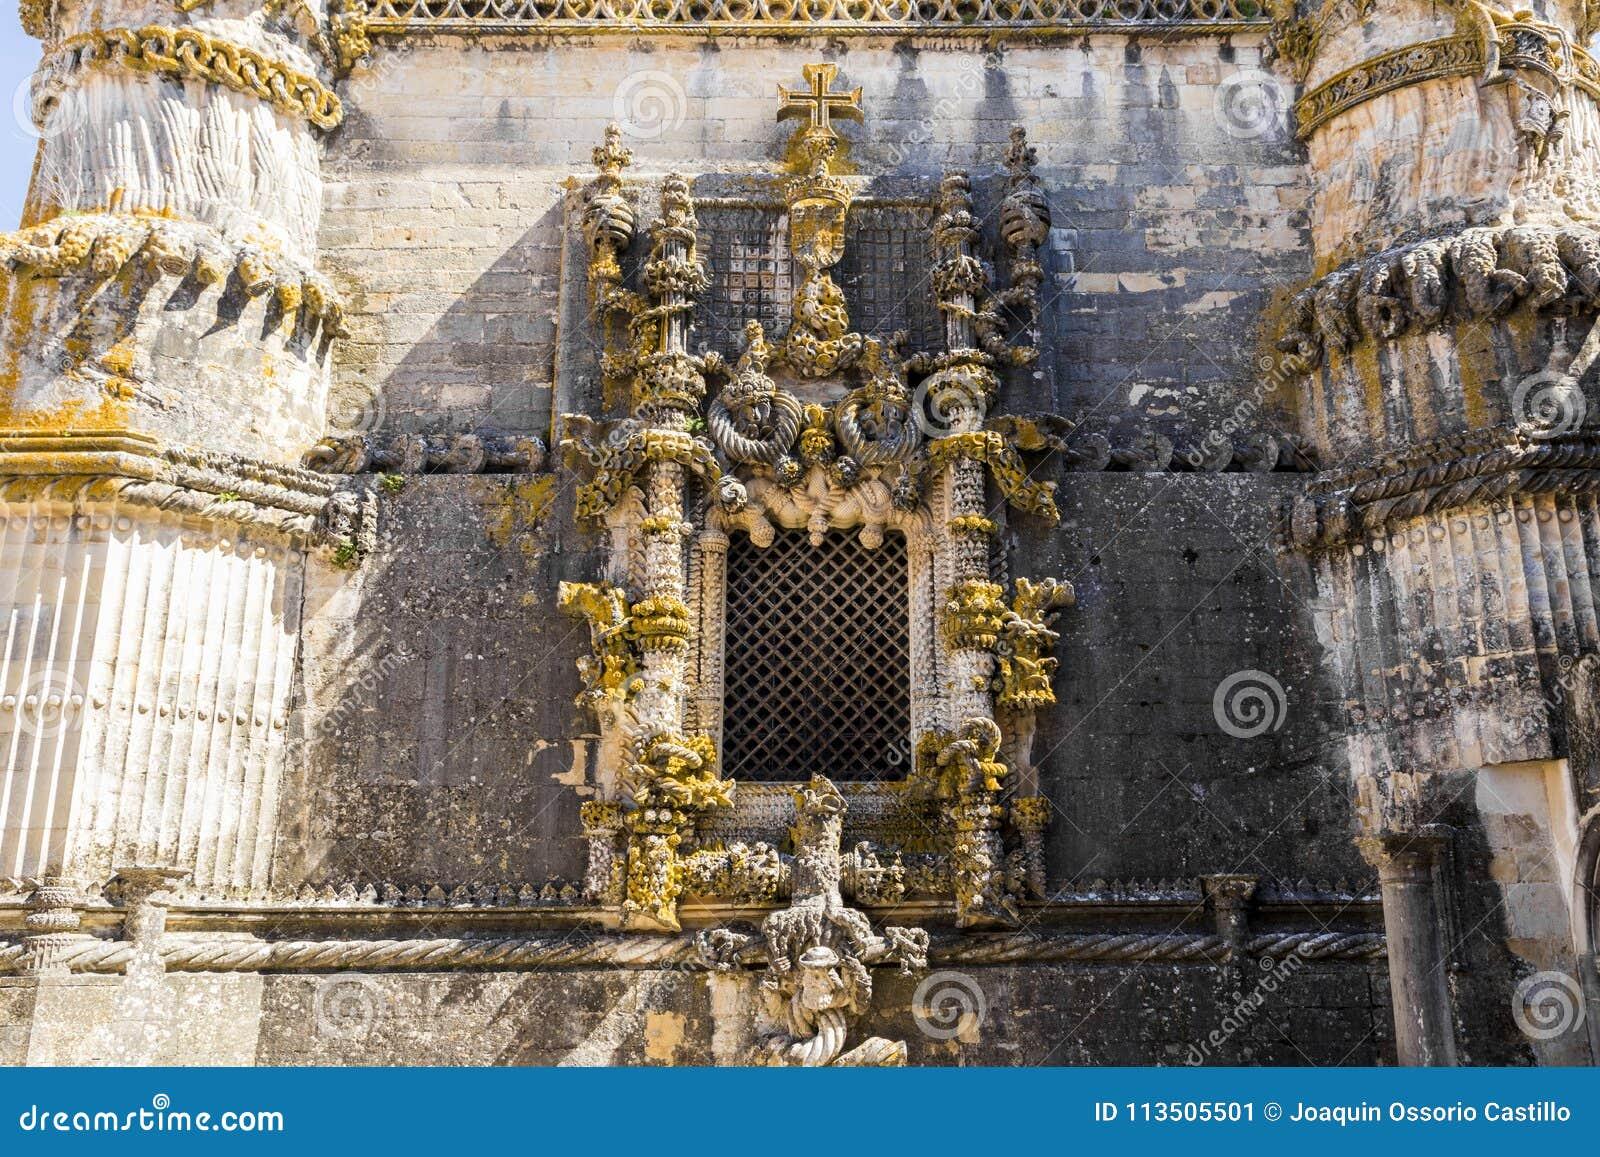 Couvent du Christ, Tomar, Portugal